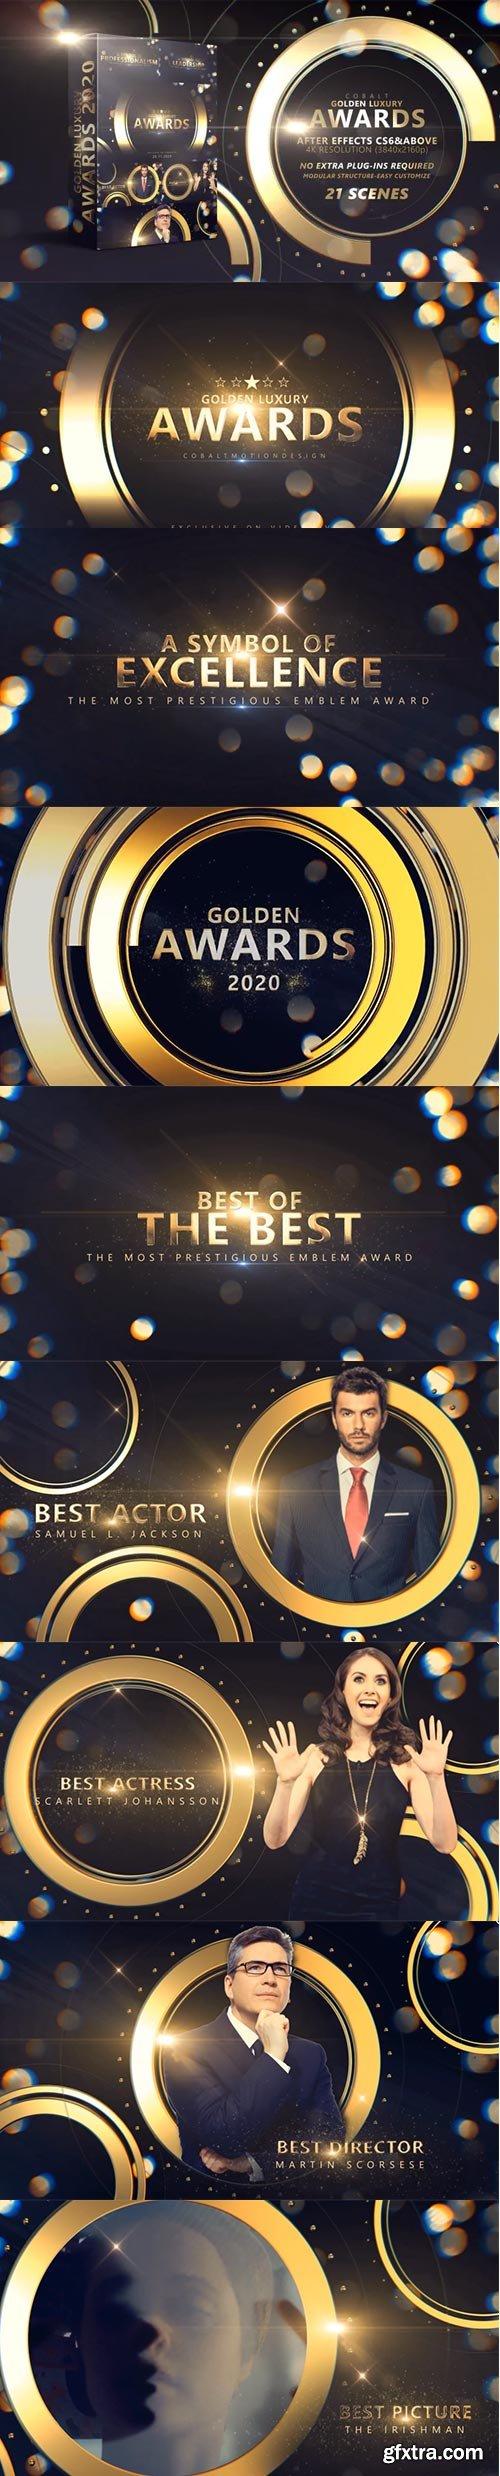 Videohive - Cobalt Golden Luxury Awards 4K - 29533719